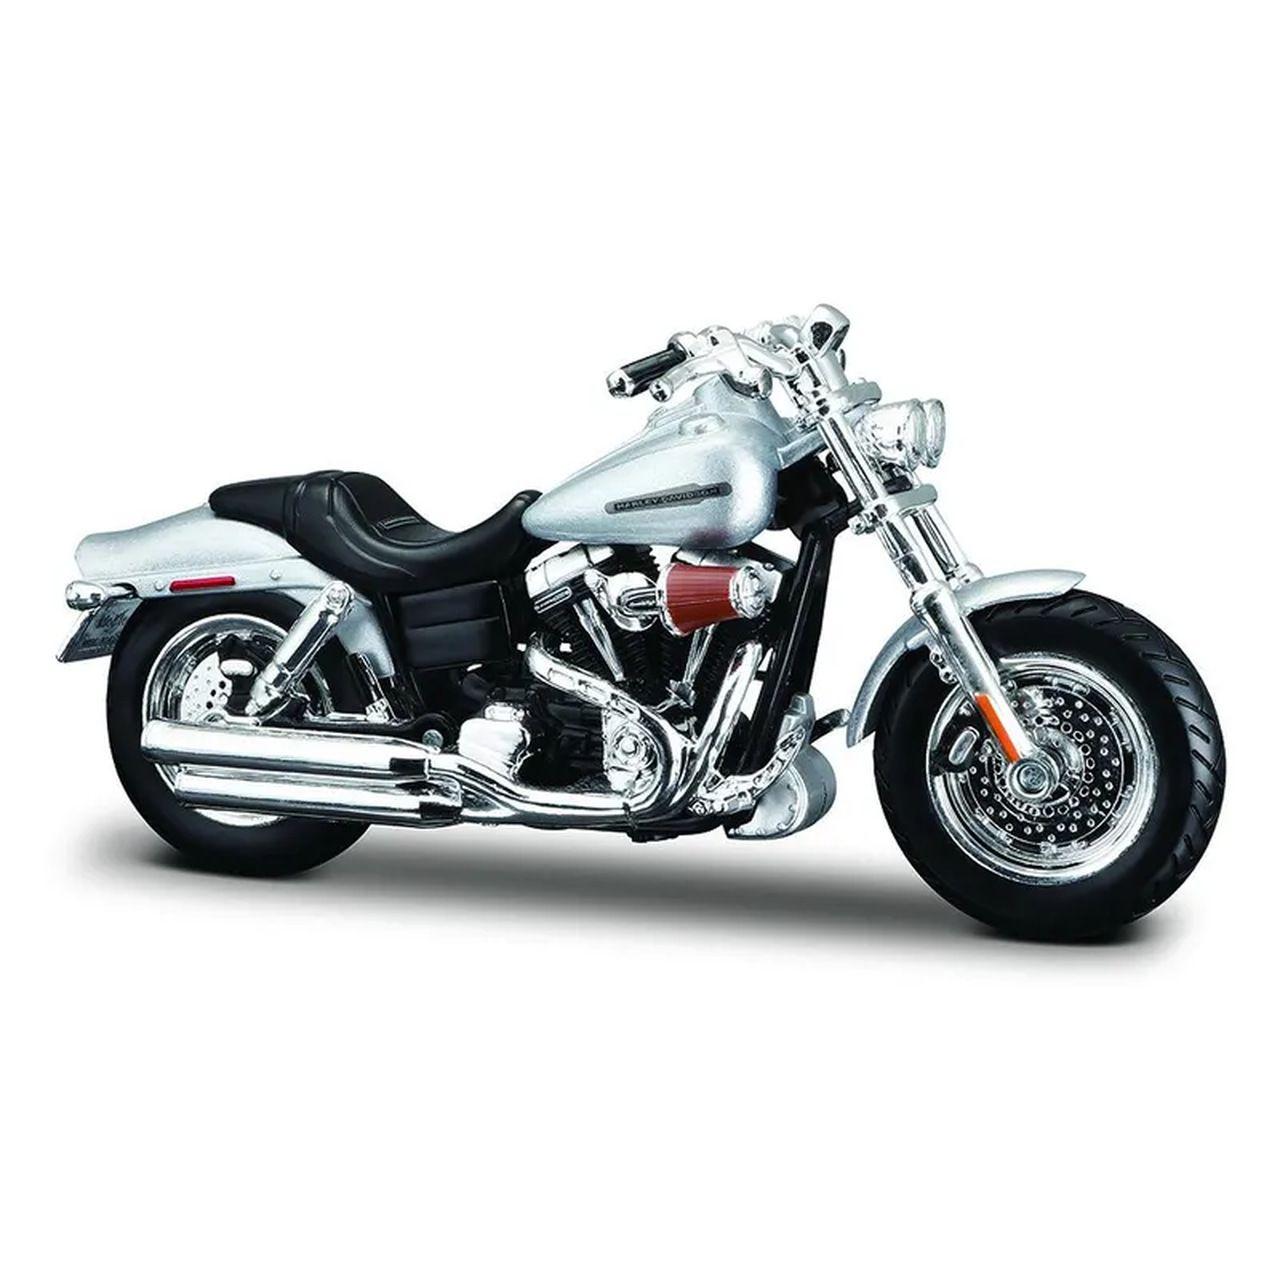 Miniatura Moto 2009 FXDFSE CVO FAT BOB: Harley Davidson (Serie 36) Escala 1/18 - Maisco